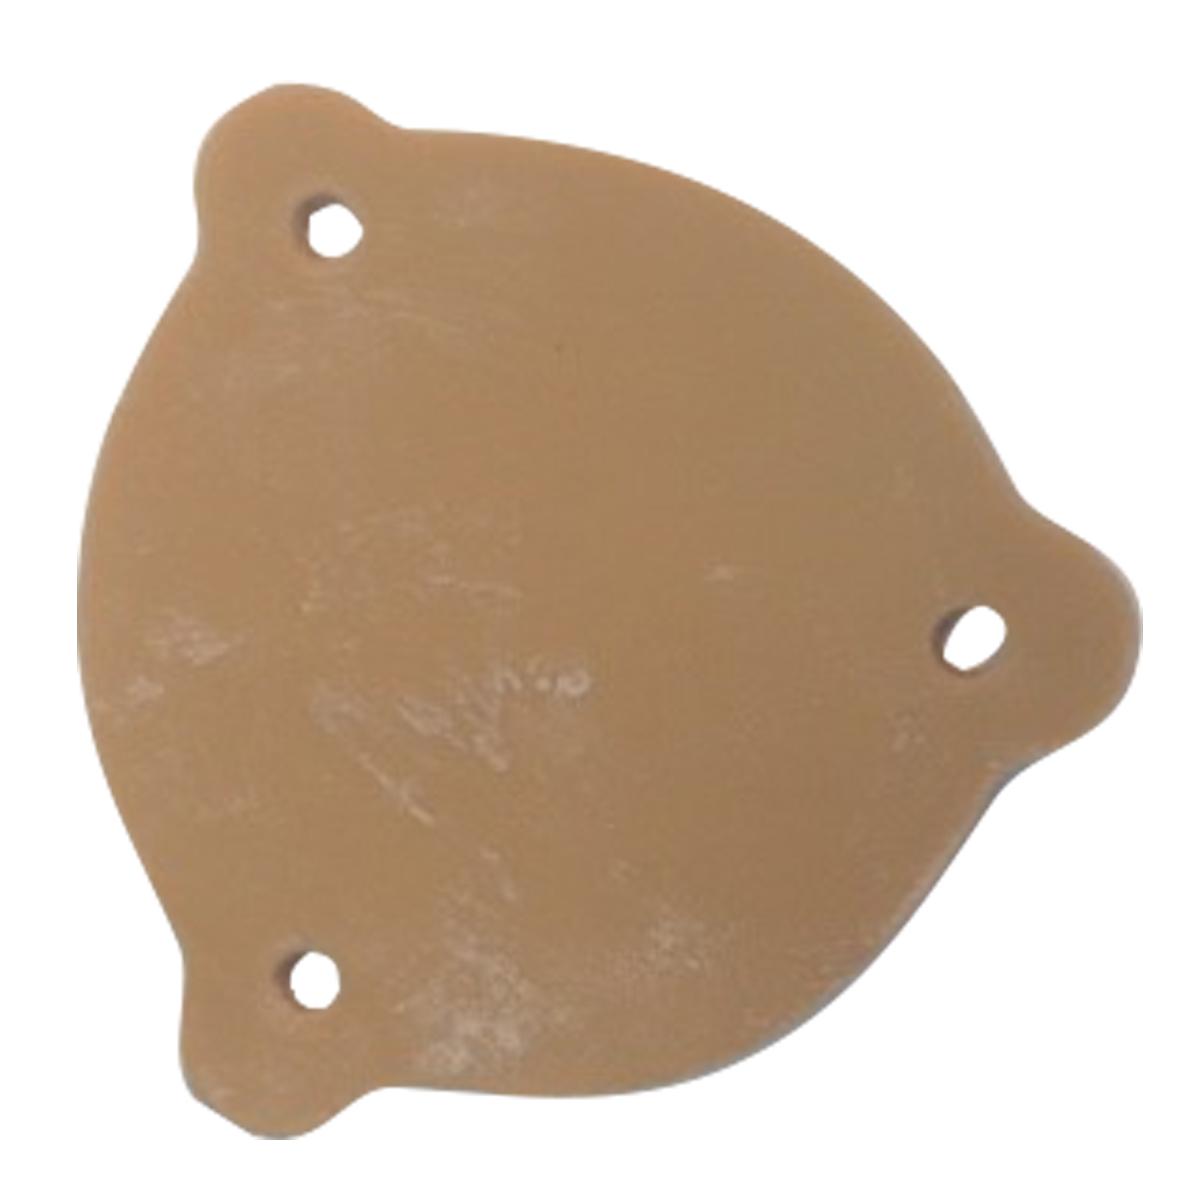 Rubber Diaphragm  - GGW-8932